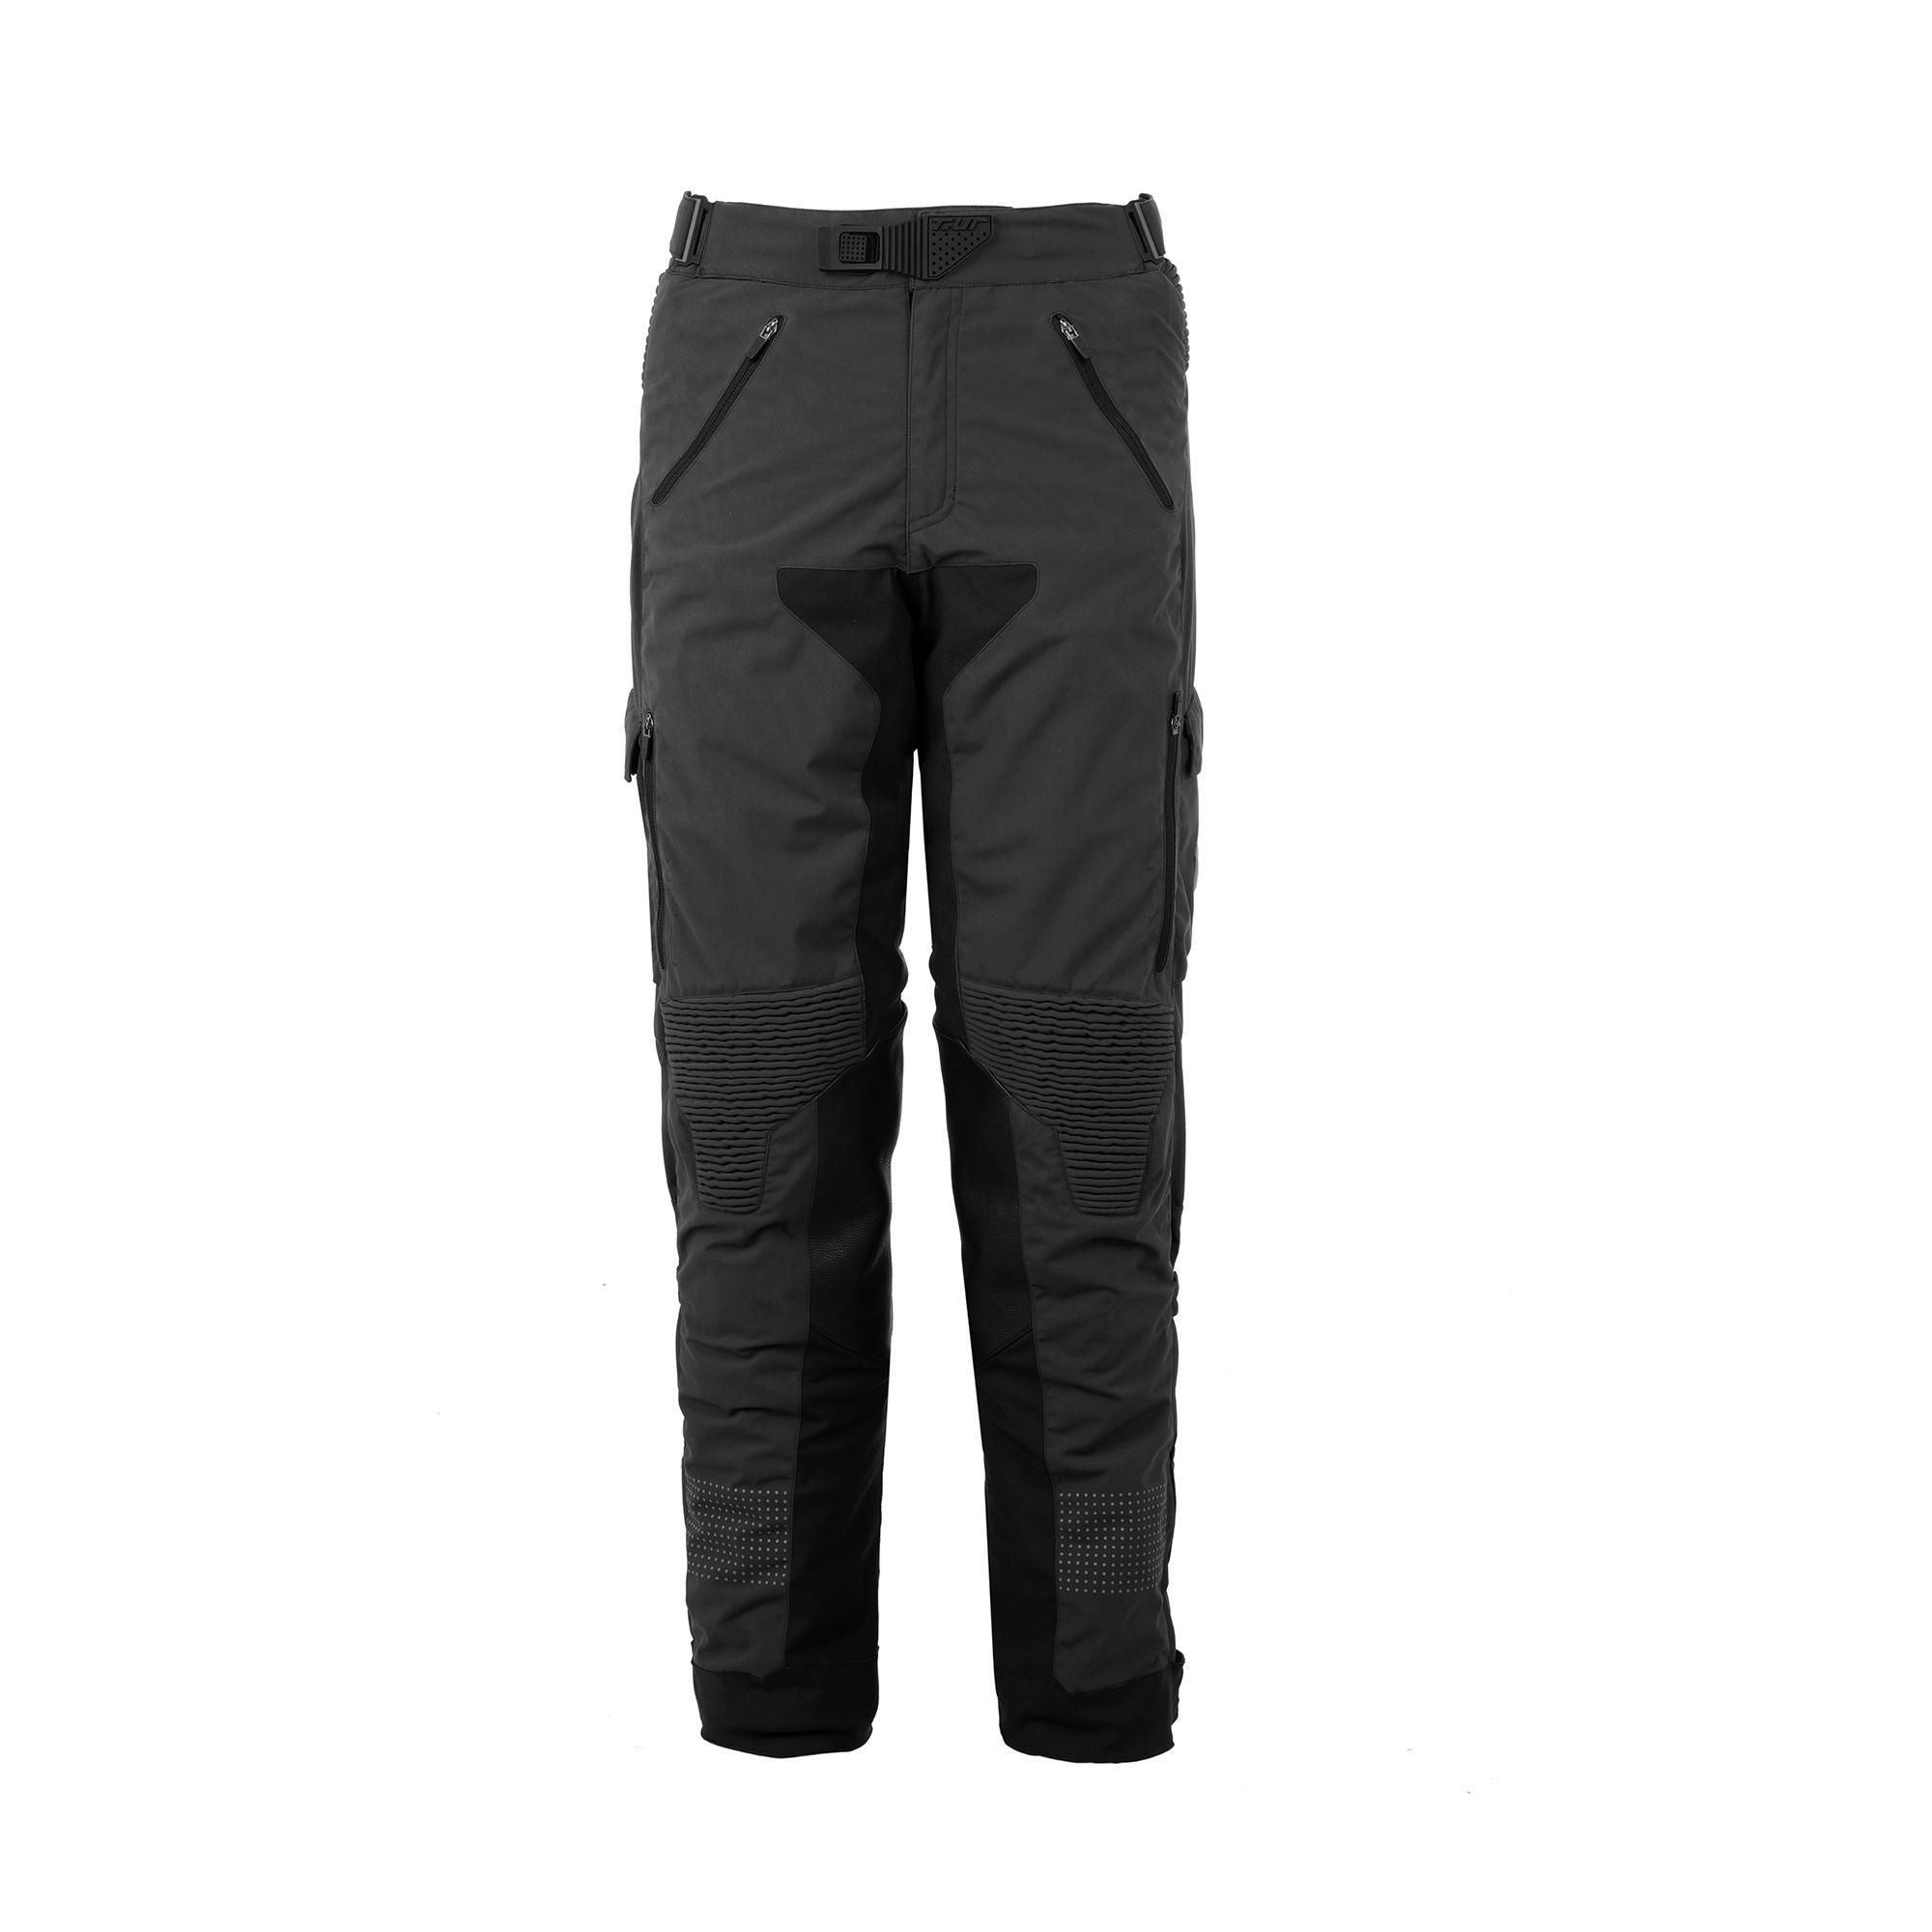 Pantalón P-one Black